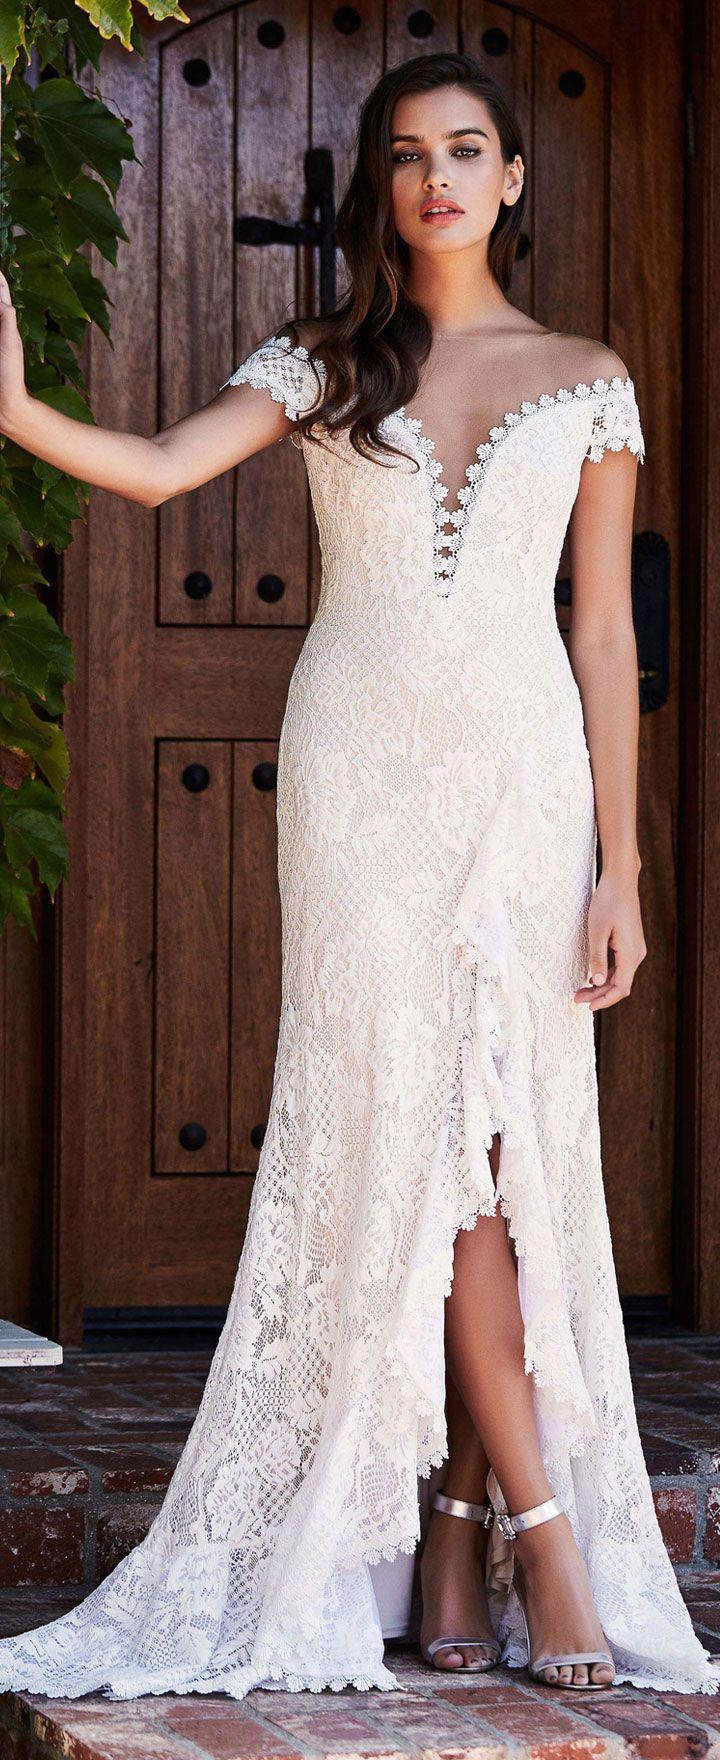 Tadashi Shoji Bridal Fall 2018 Wedding Dress Collection | Brautmode ...